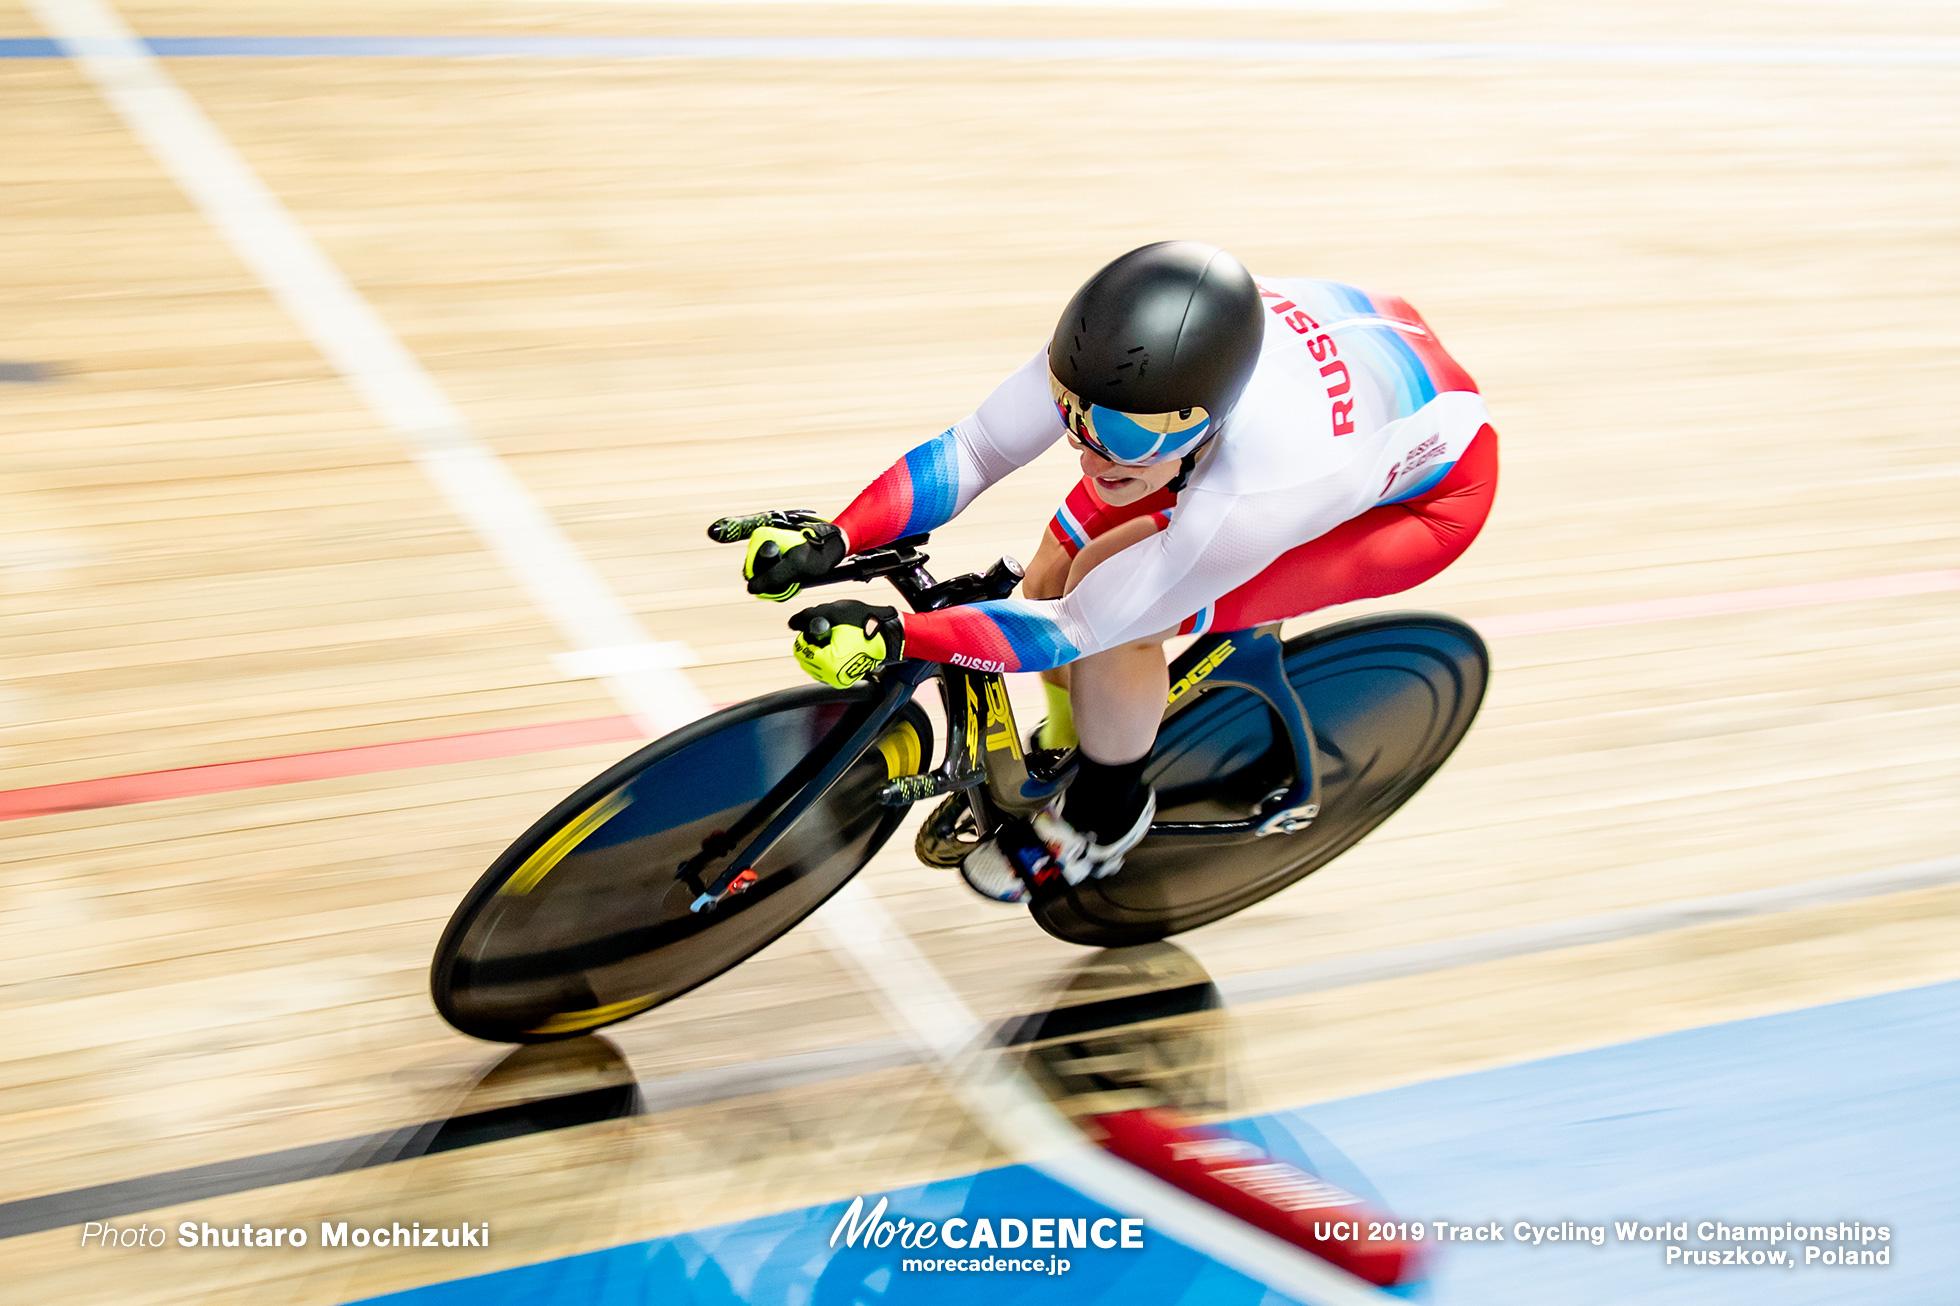 Women's 500m TT / 2019 Track Cycling World Championships Pruszków, Poland